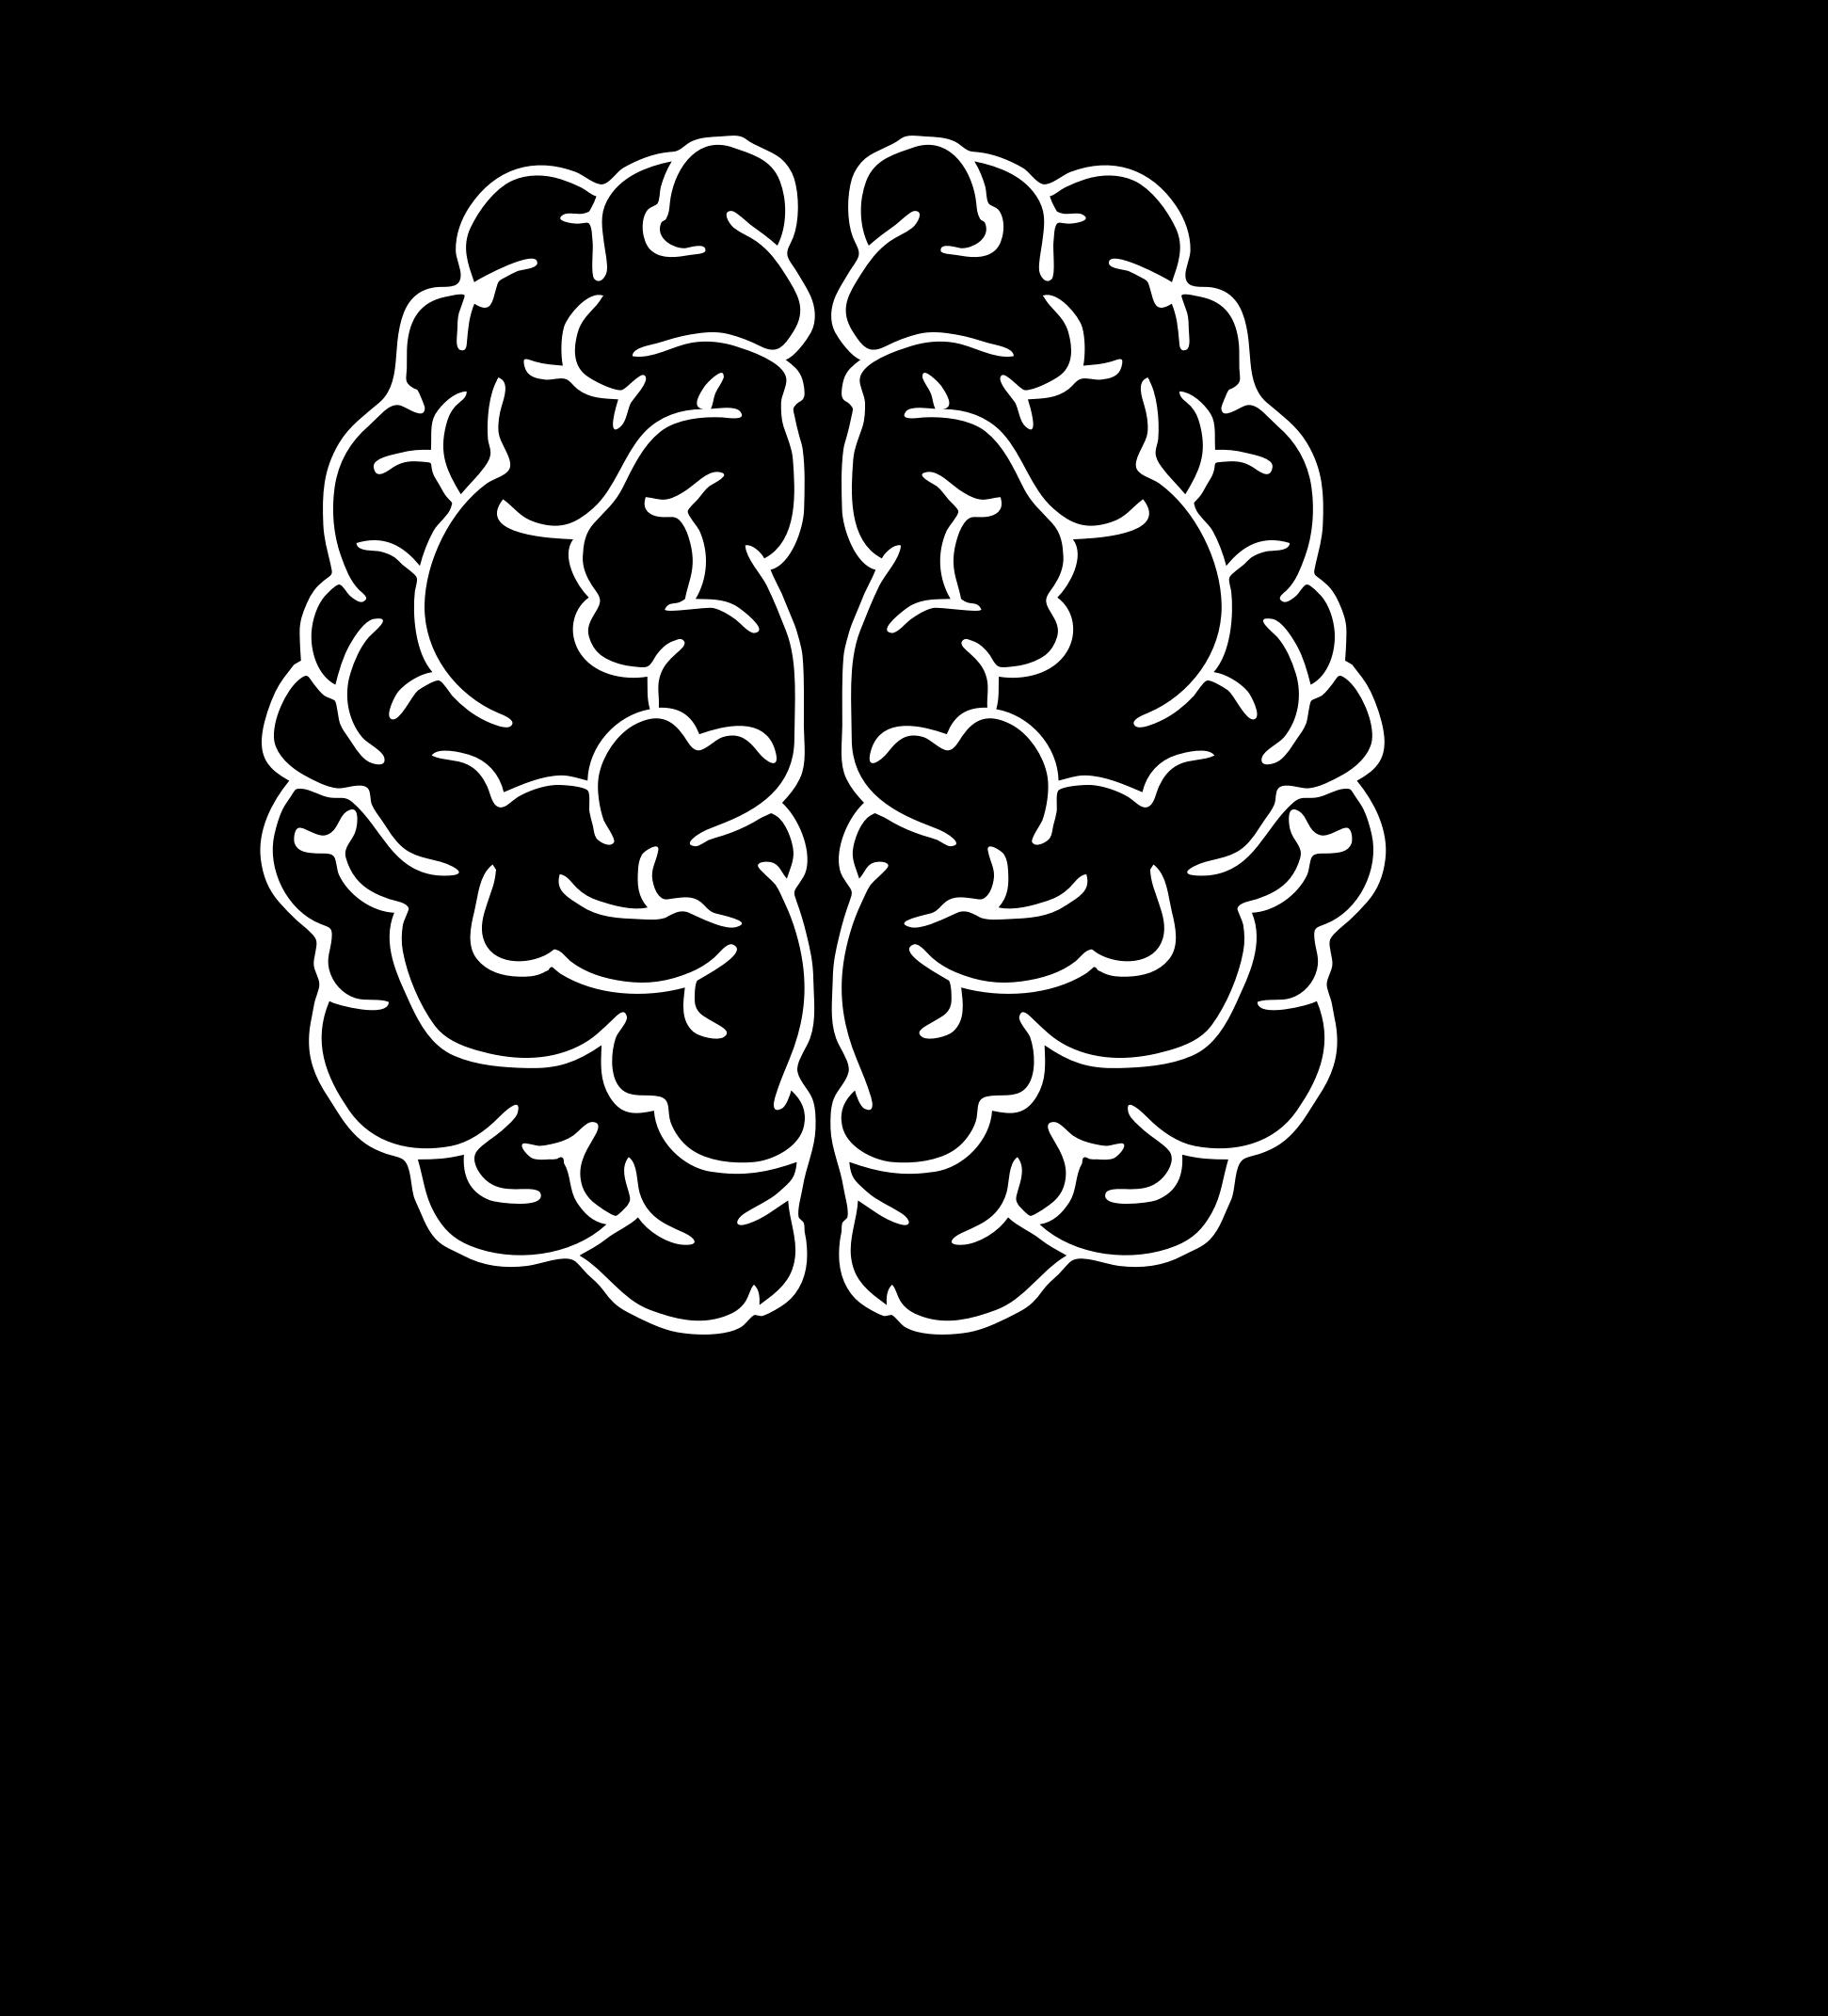 clip library In head big image. Brain clipart man